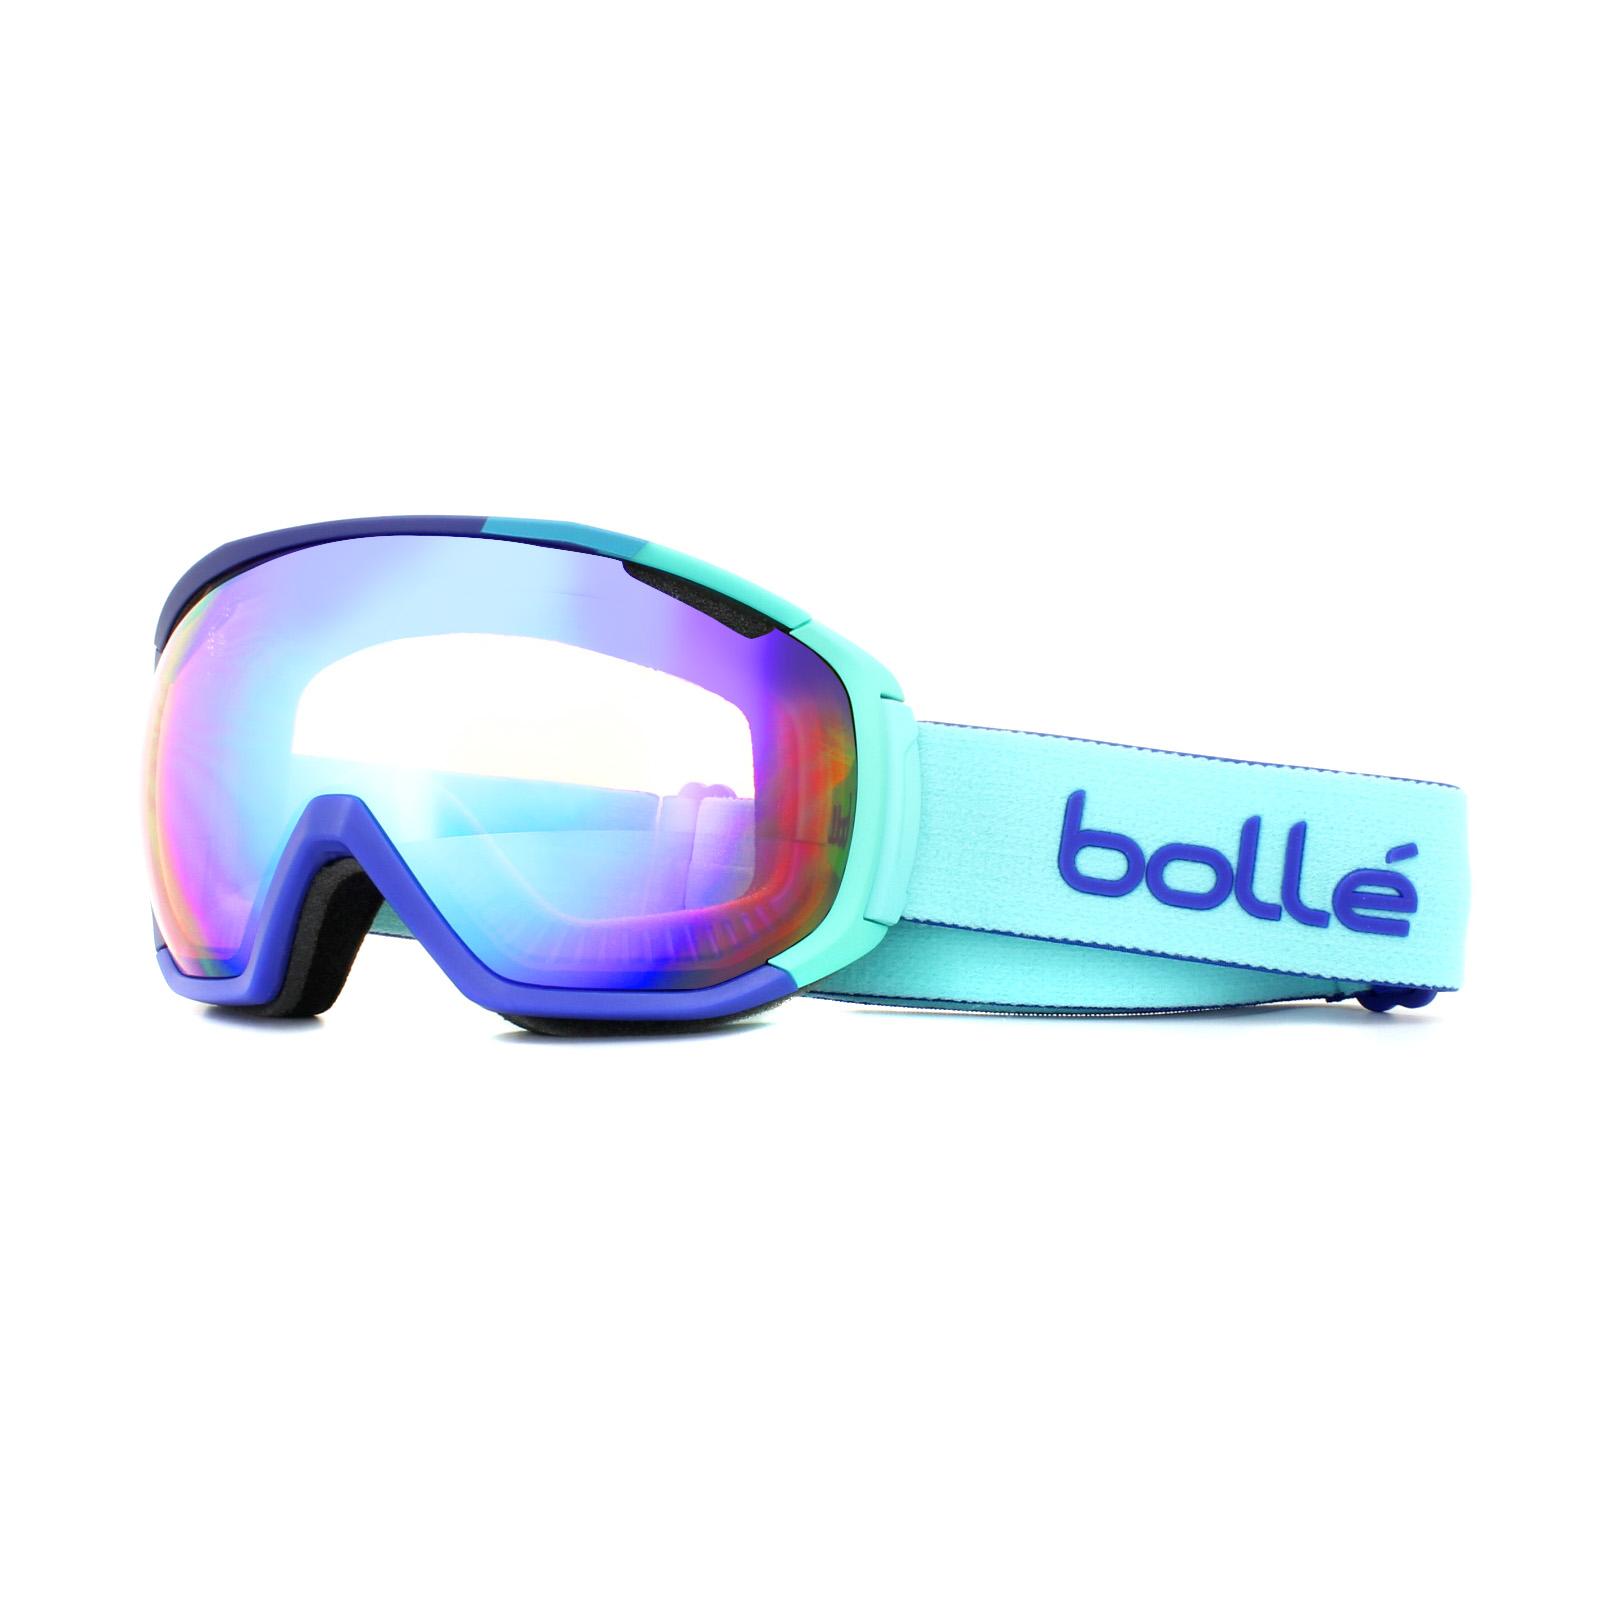 b1761e1915f5 Cheap Bolle Tsar Ski Goggles - Discounted Sunglasses